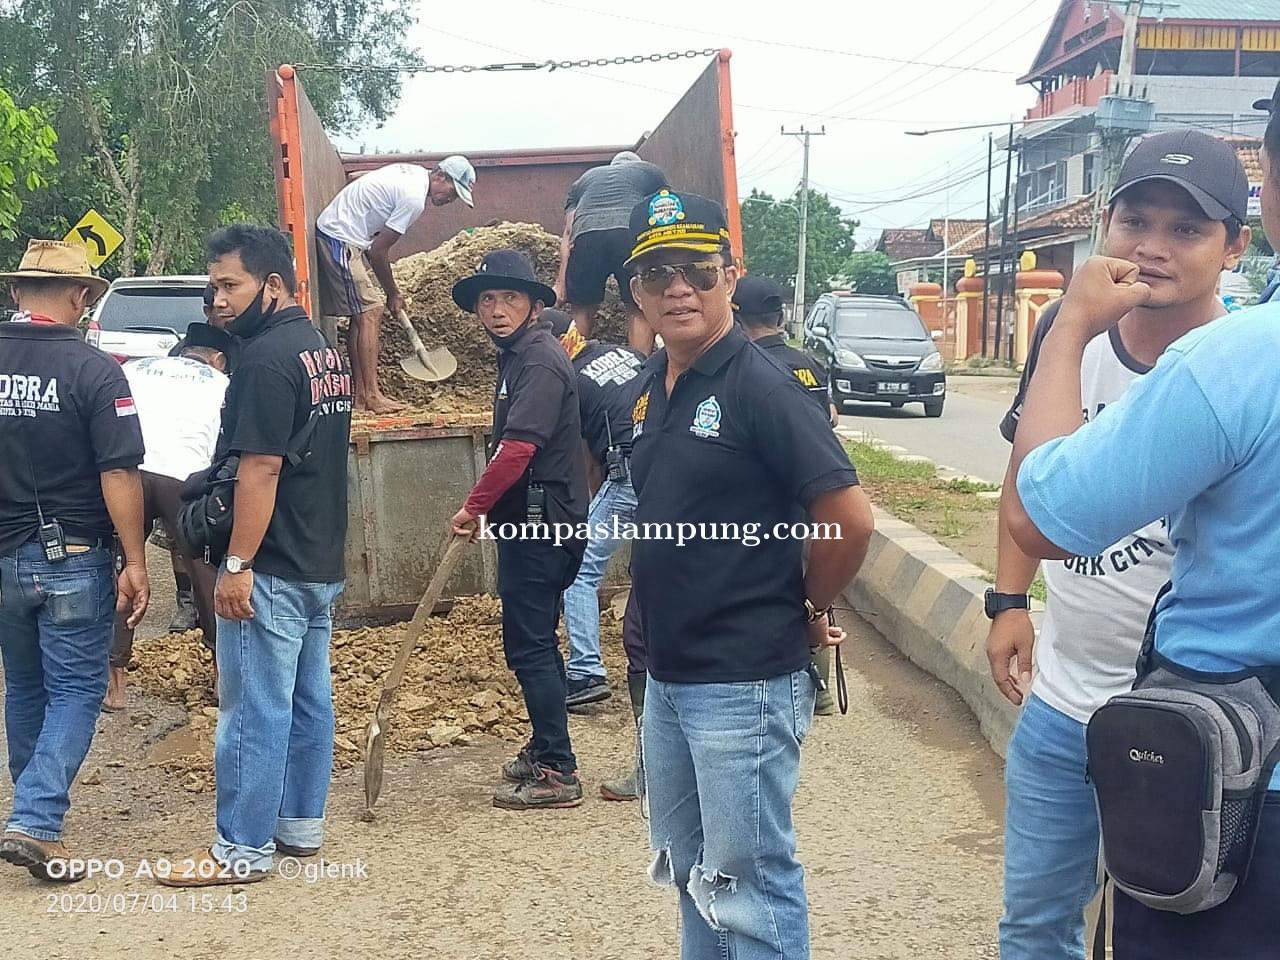 Bosan Dengan Janji, Warga Banjarsari Tambal Jalan Pattimura Secara Swadaya